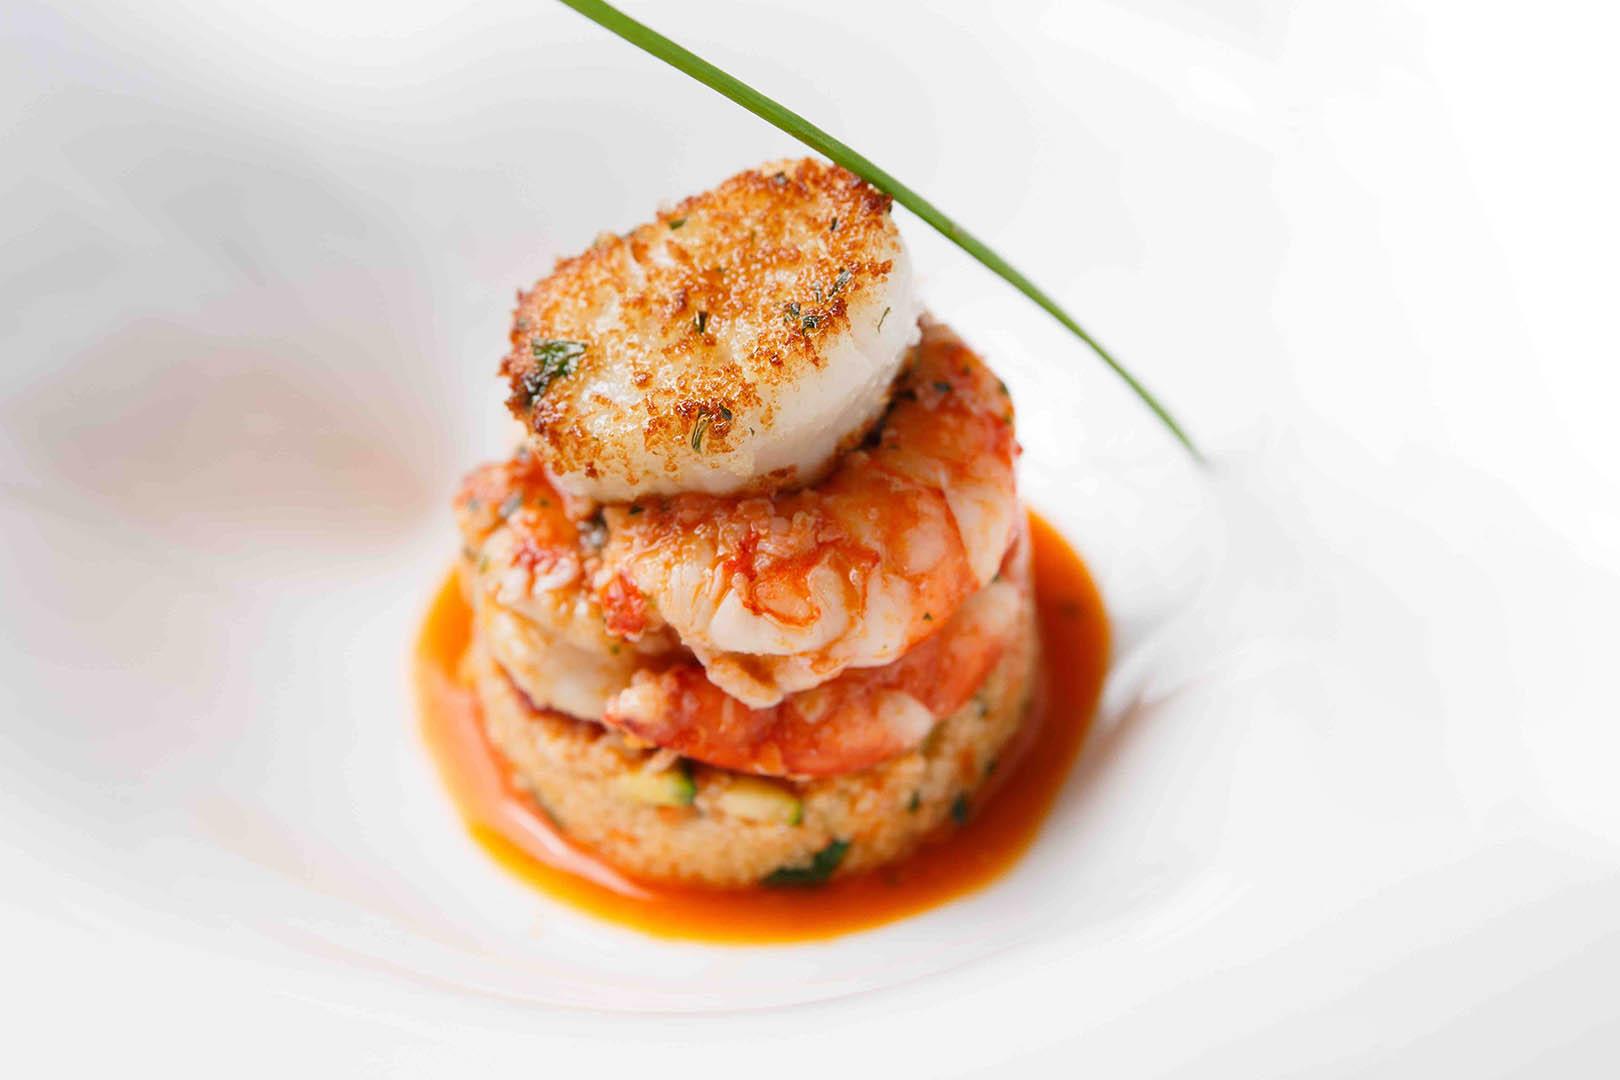 Restaurant Mancini, La Gastronomia Italiana, food, Scan Magazine, August 2019